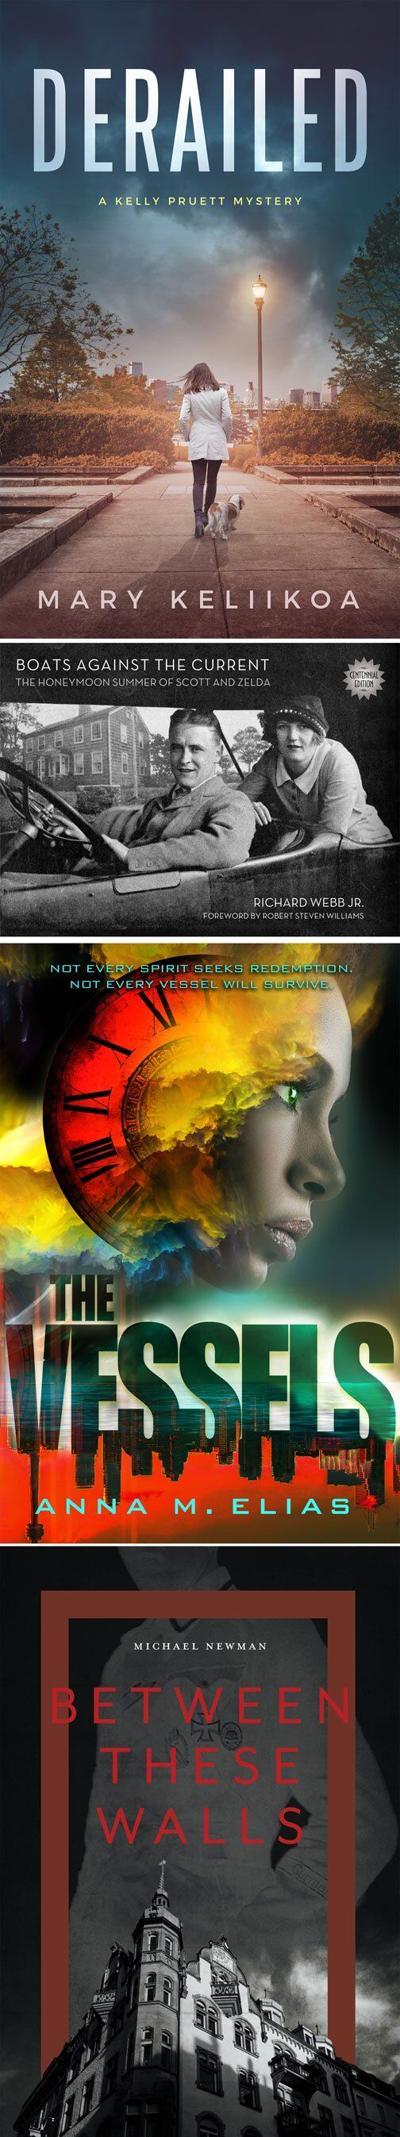 BookBites: A Reading Potpourri of Fiction, Nonfiction and Spiritual